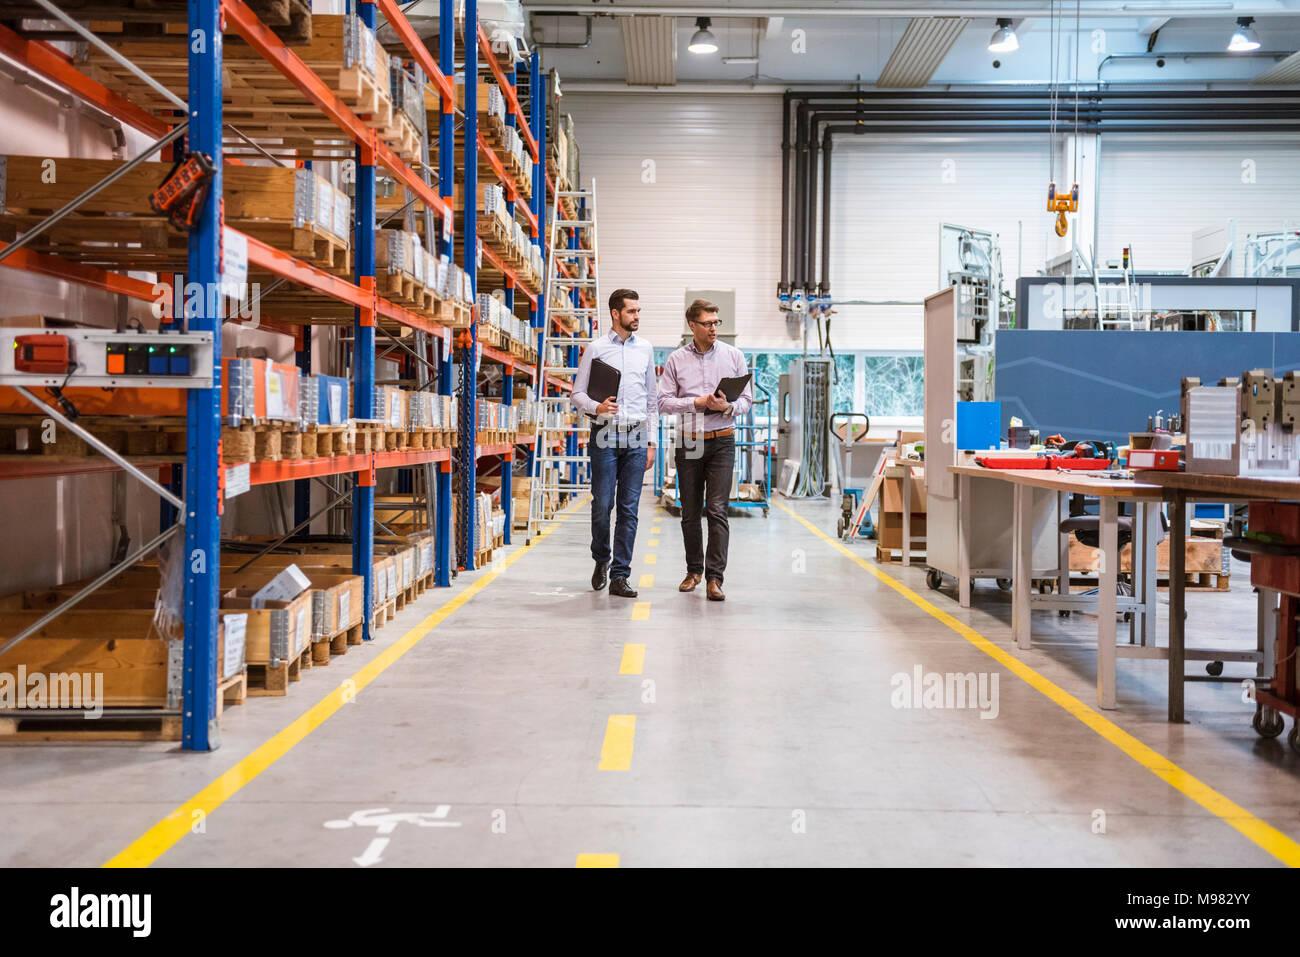 Two men walking in factory - Stock Image